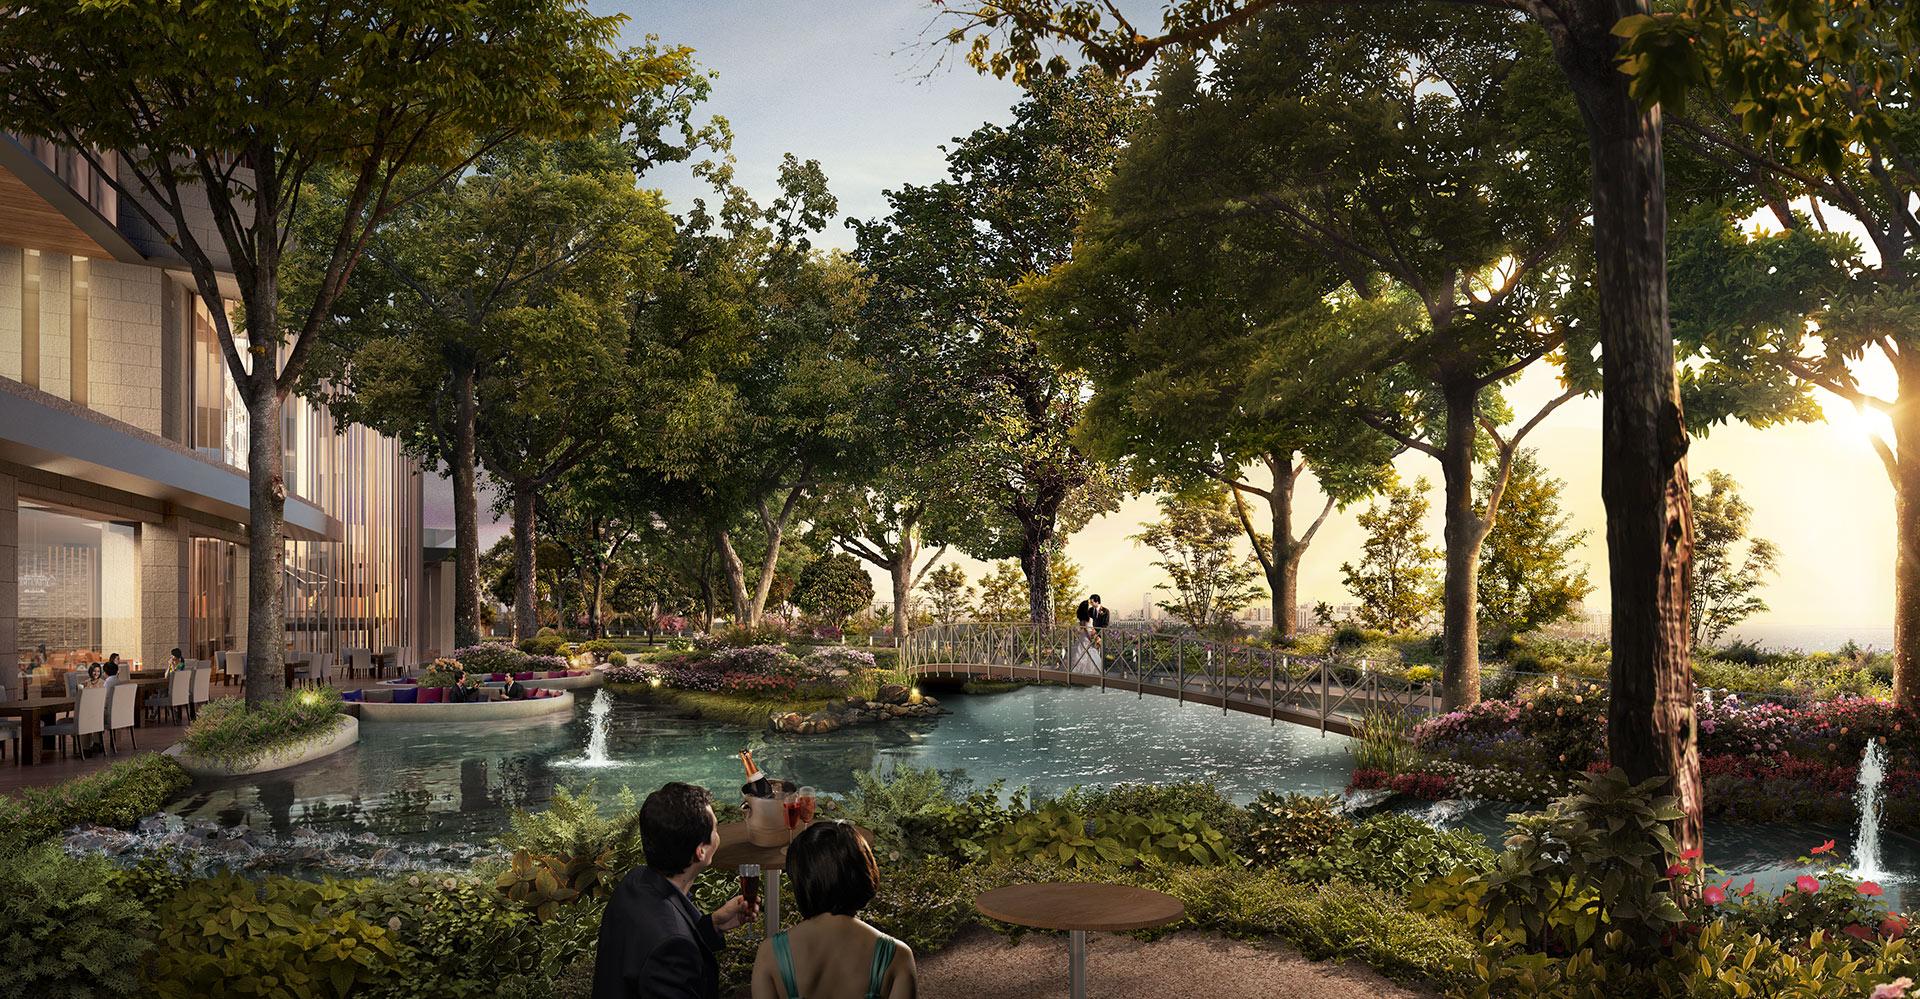 Chengdu Mixed-Use Development and Hyatt Regency Garden